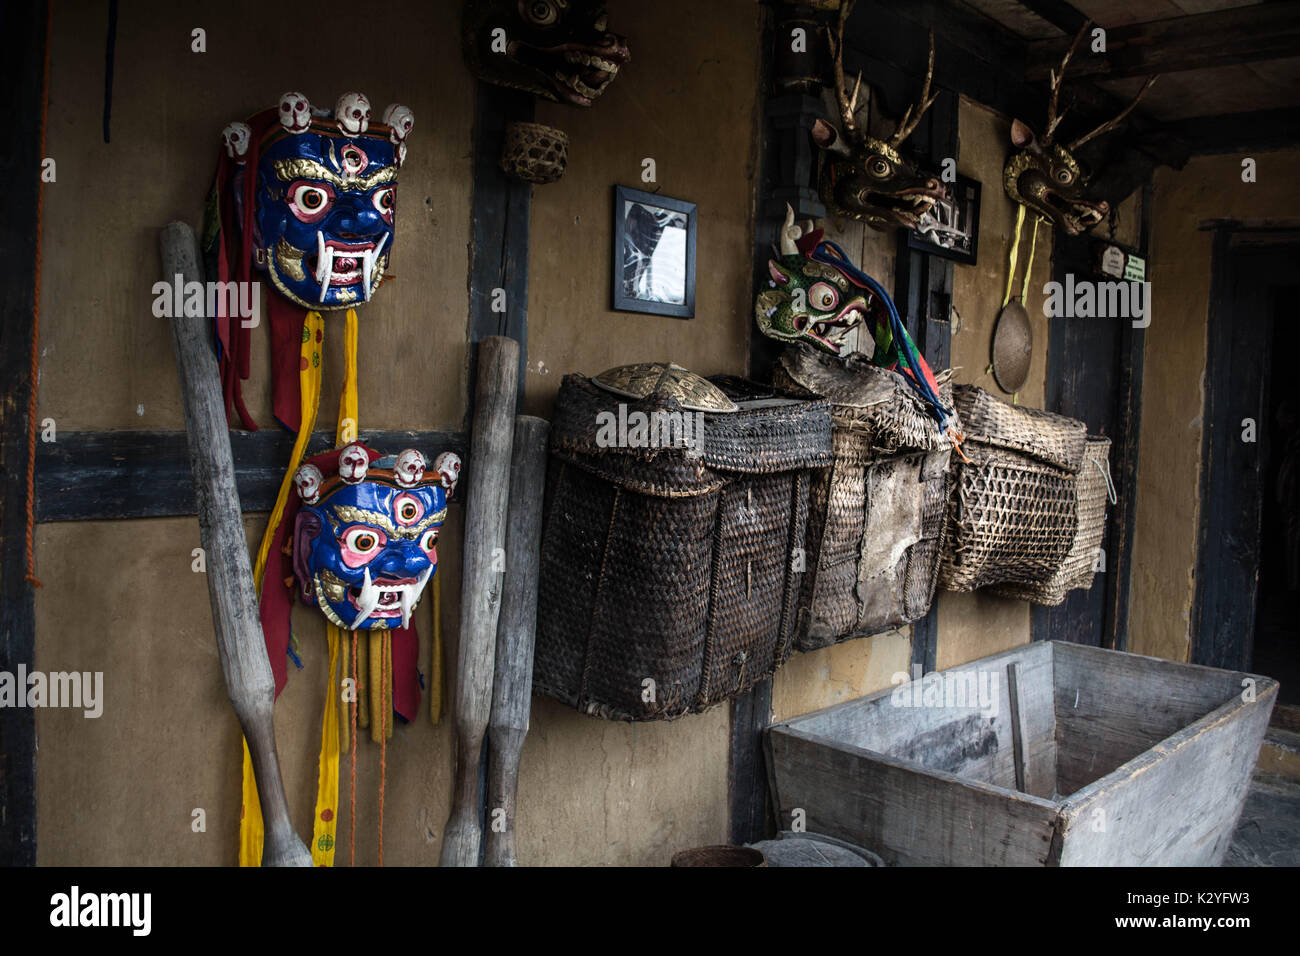 Bhutanese Traditional Home Interiors - Stock Image